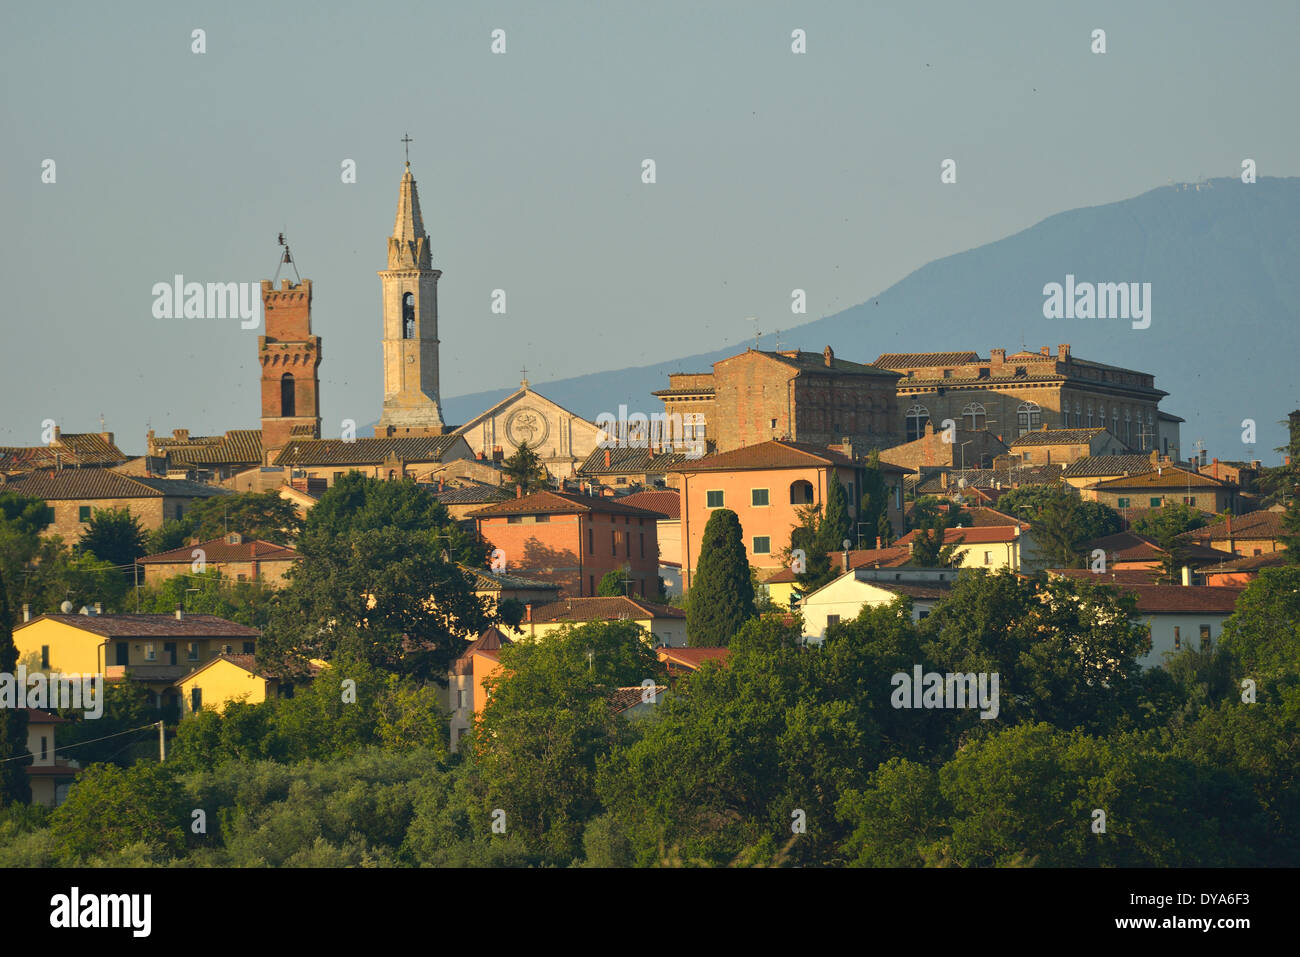 Europe mediterranean italian Italy Tuscany Siena Province Pienza village city hillside stucco minaret spire last light sunse - Stock Image